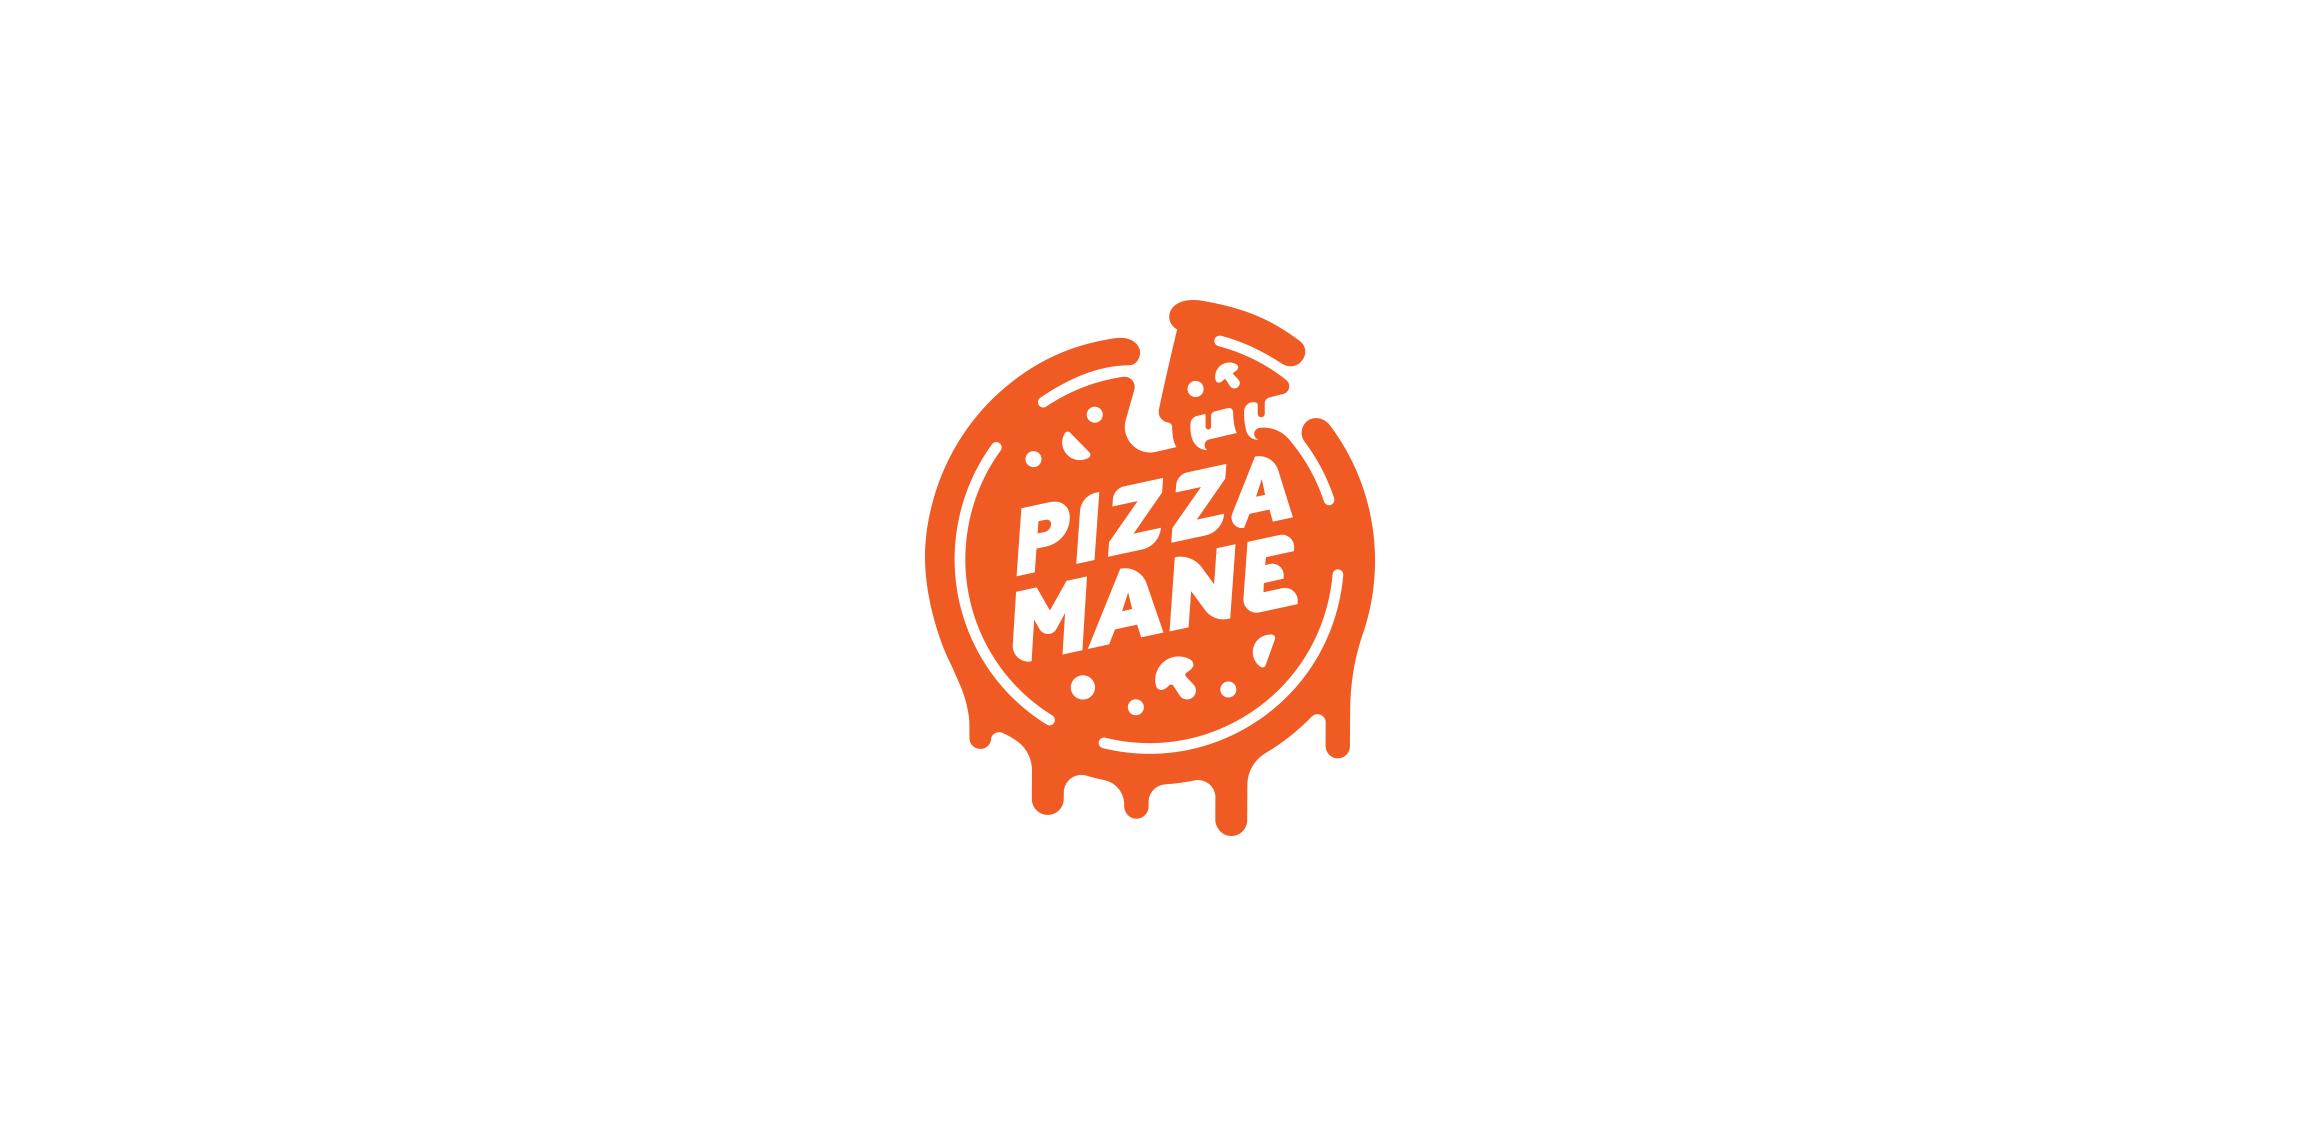 Pizza Mane